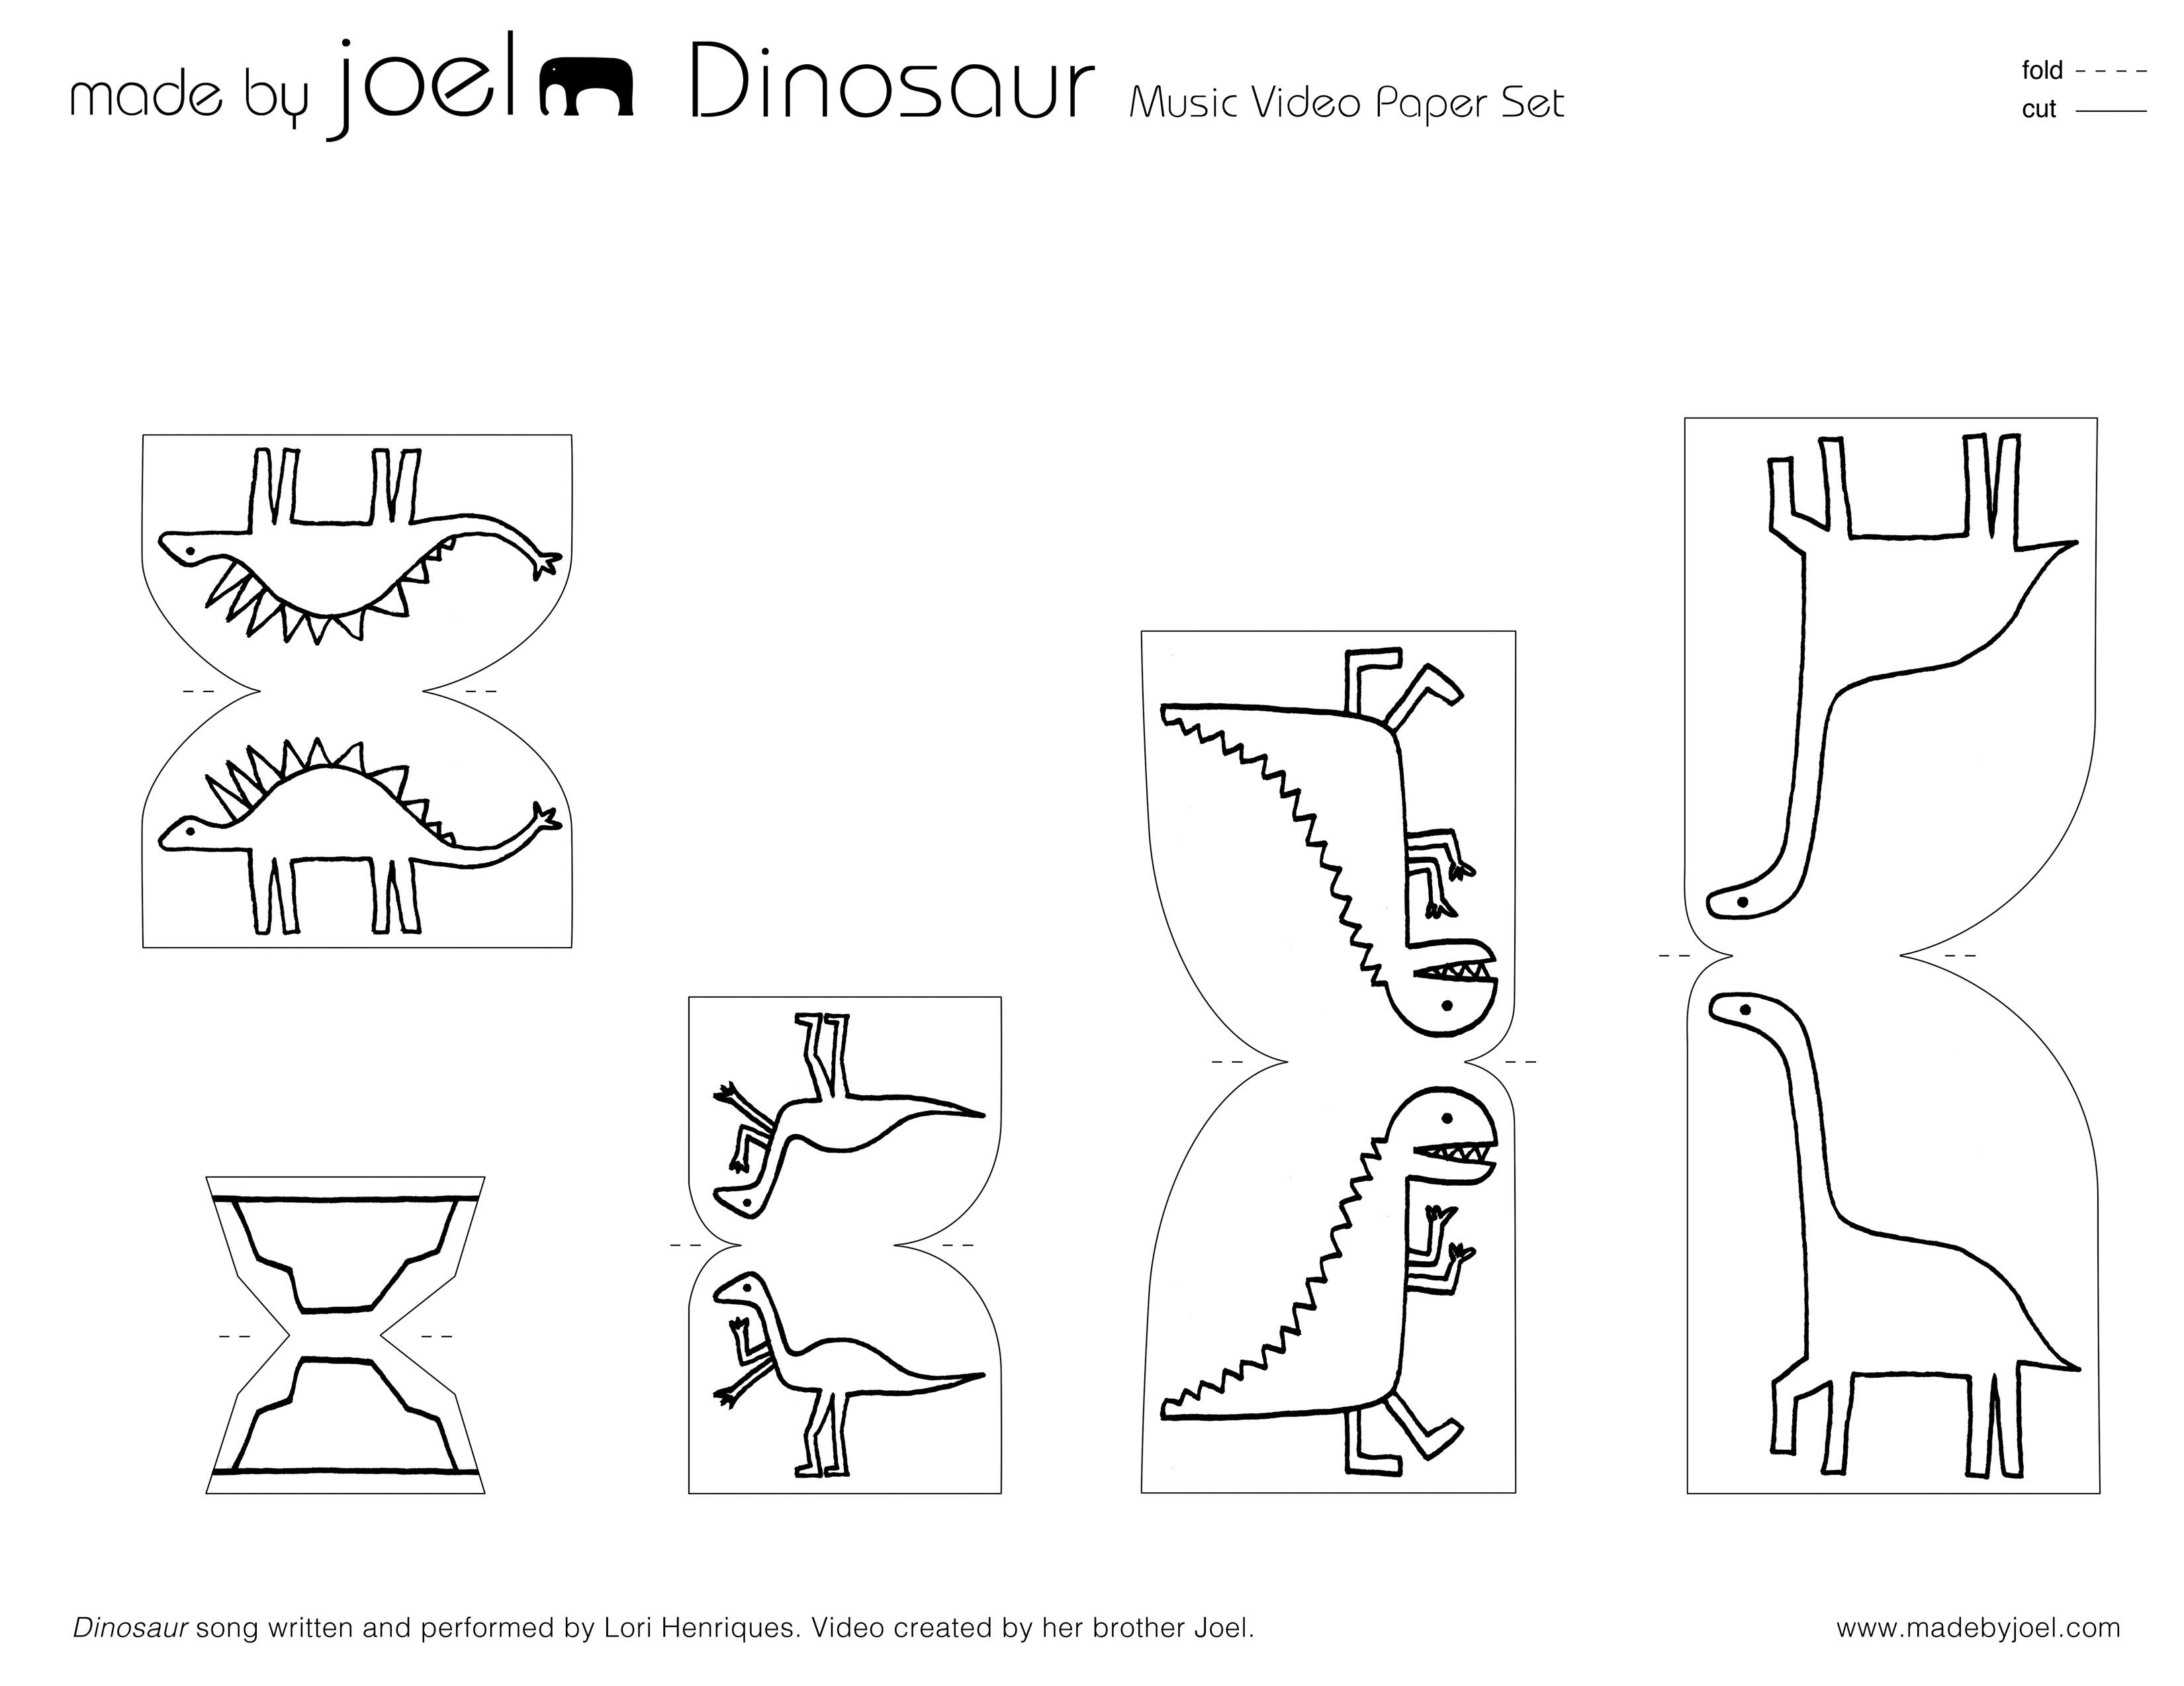 Made By Joel Made By Joel Dinosaur Paper City 2